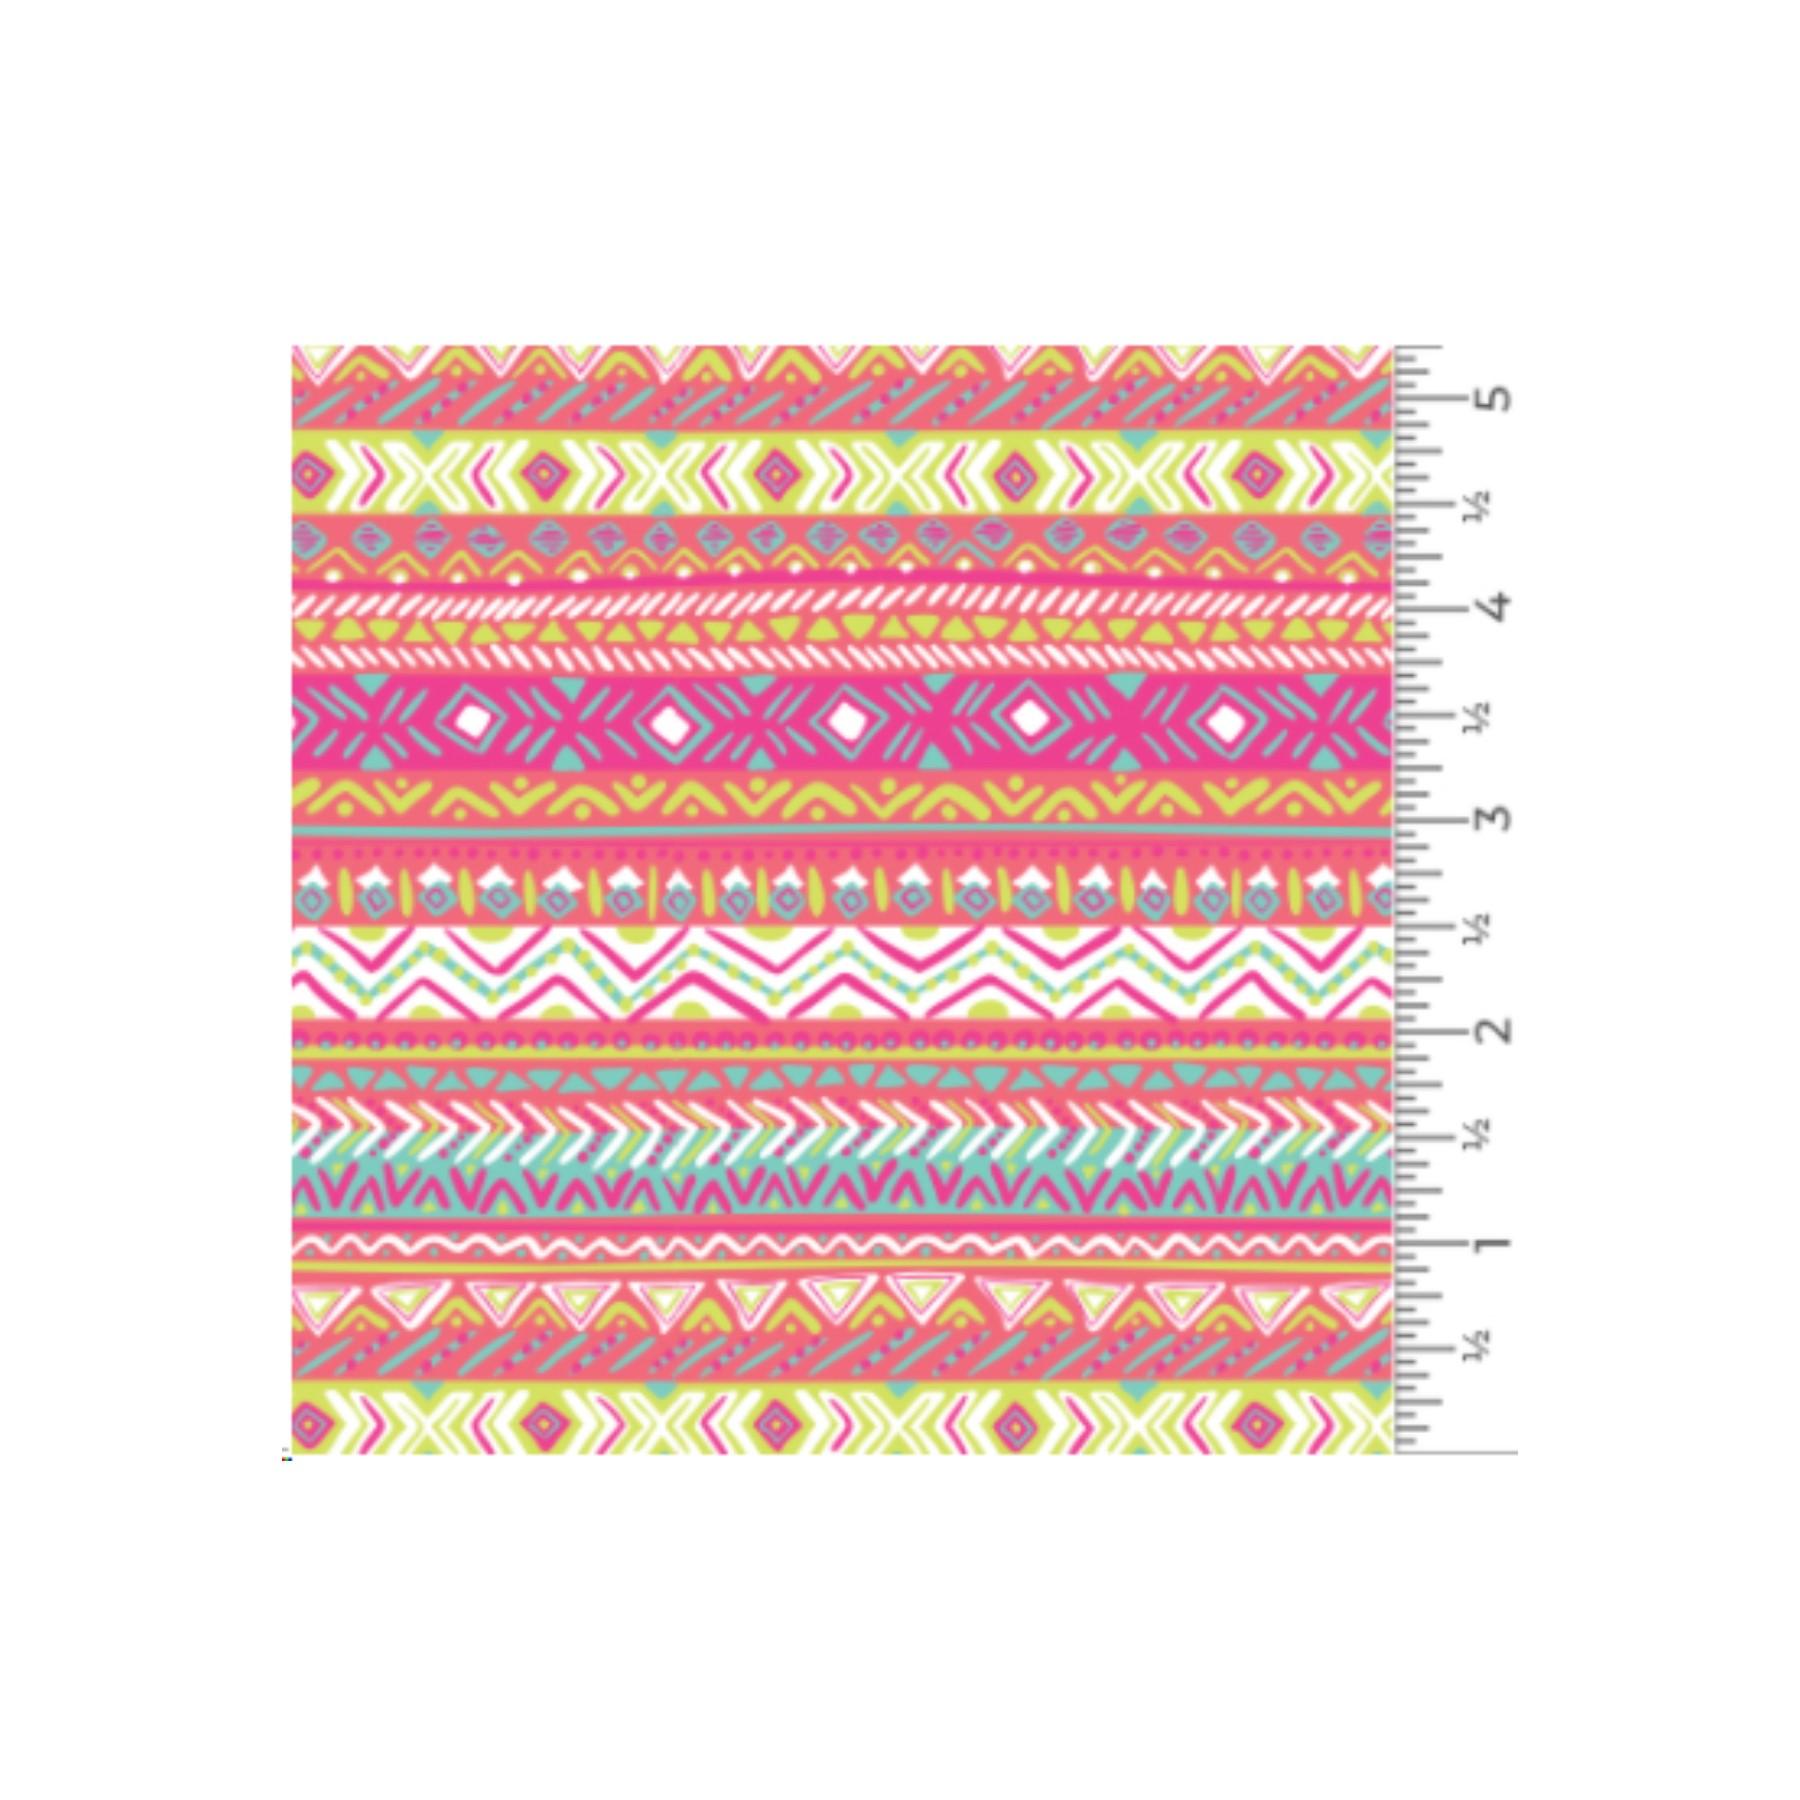 Vinilo textil diseños EasyPatterns® 30 x 50 cm Rayas bohemias